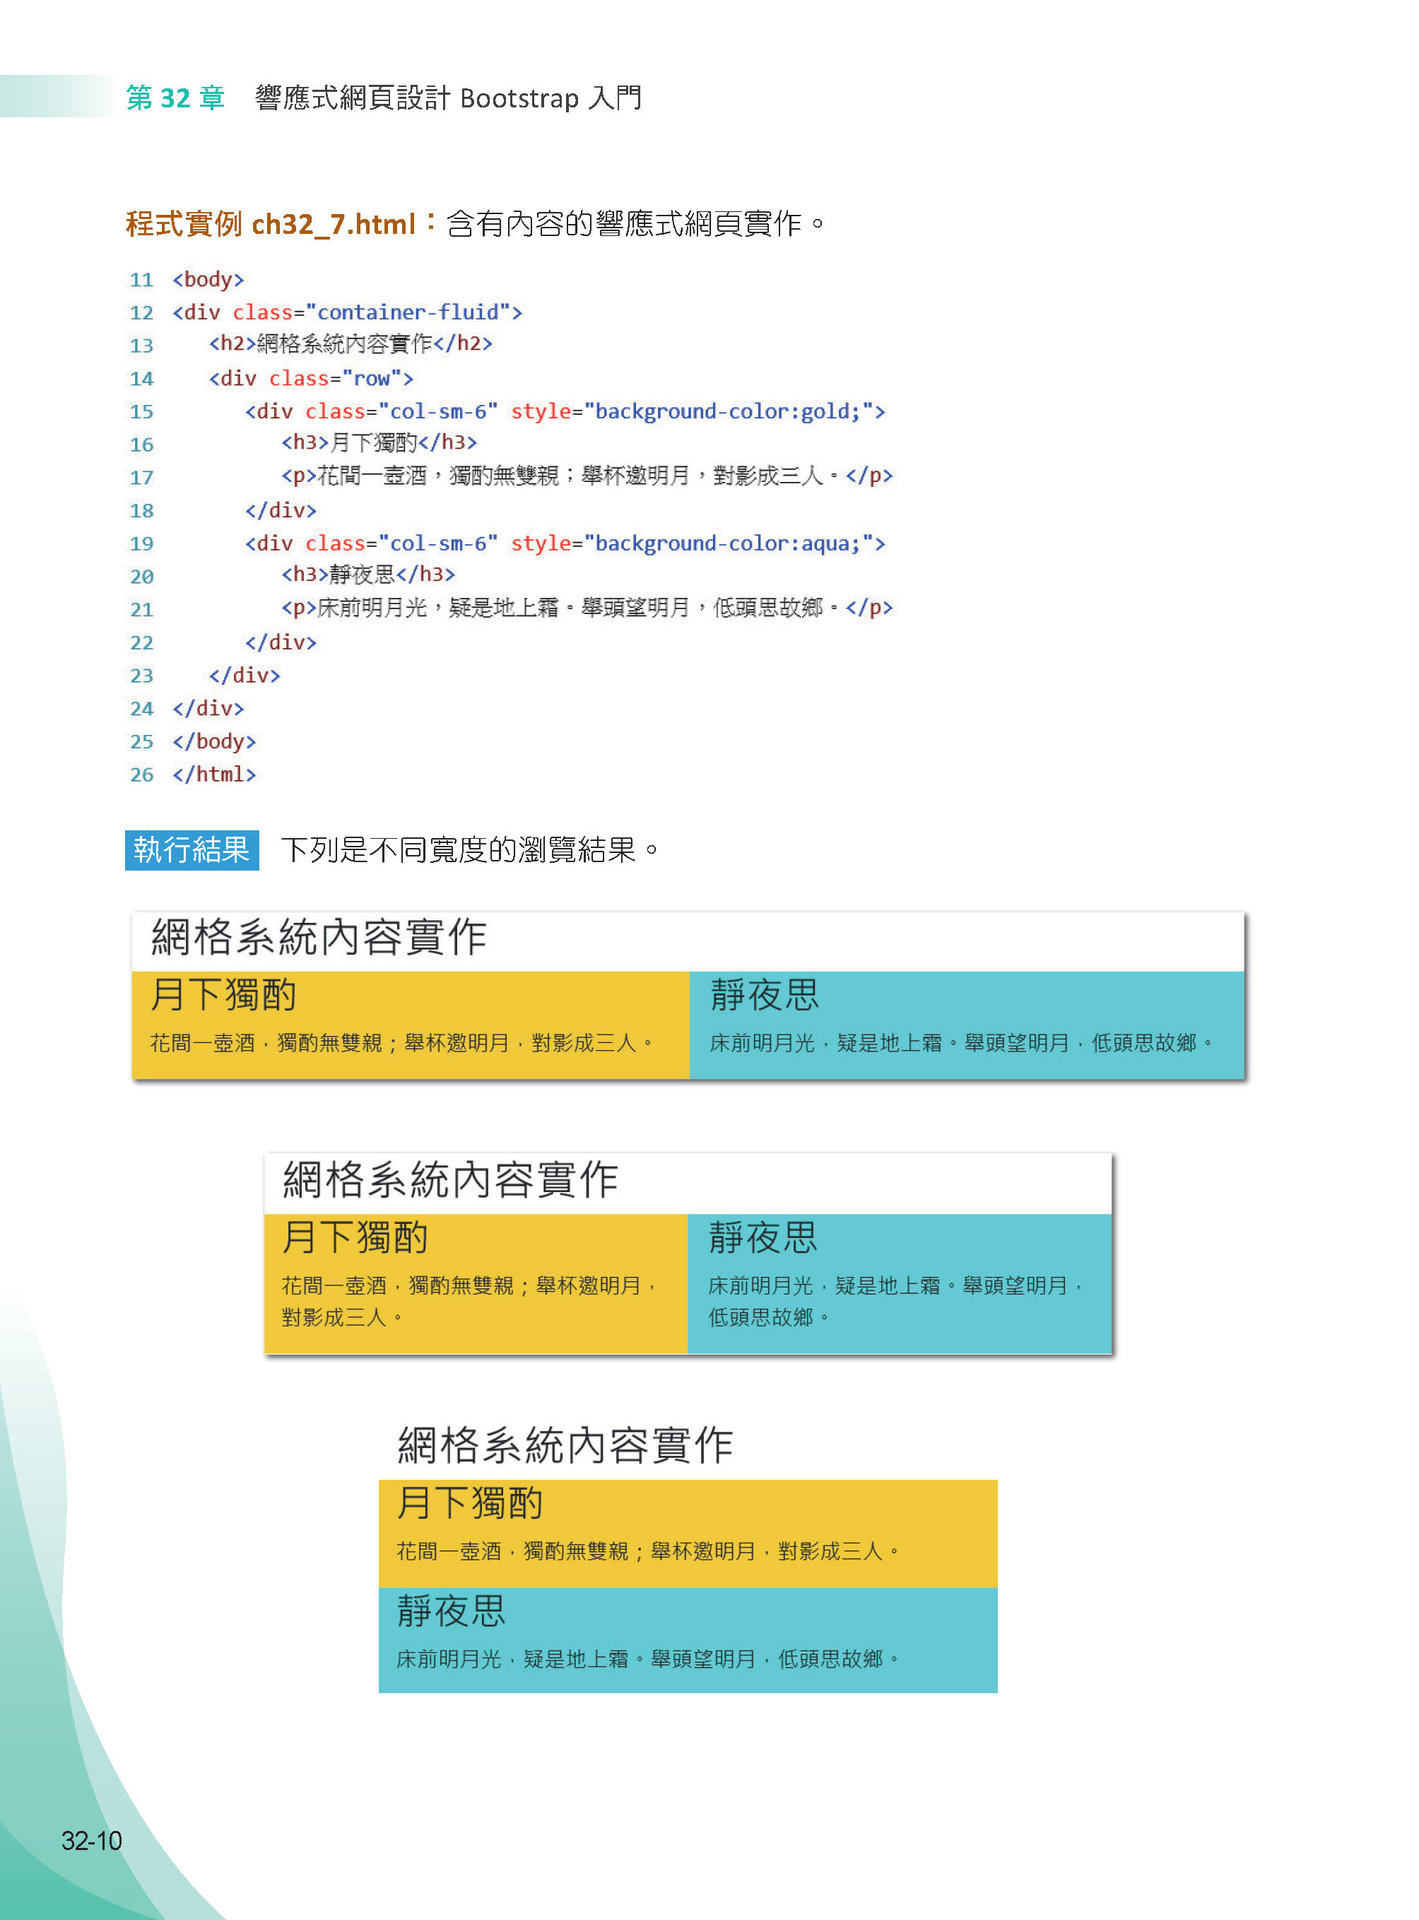 最完整跨平台網頁設計:HTML + CSS + JavaScript + jQuery + Bootstrap + Google Maps (全彩印刷)-preview-11